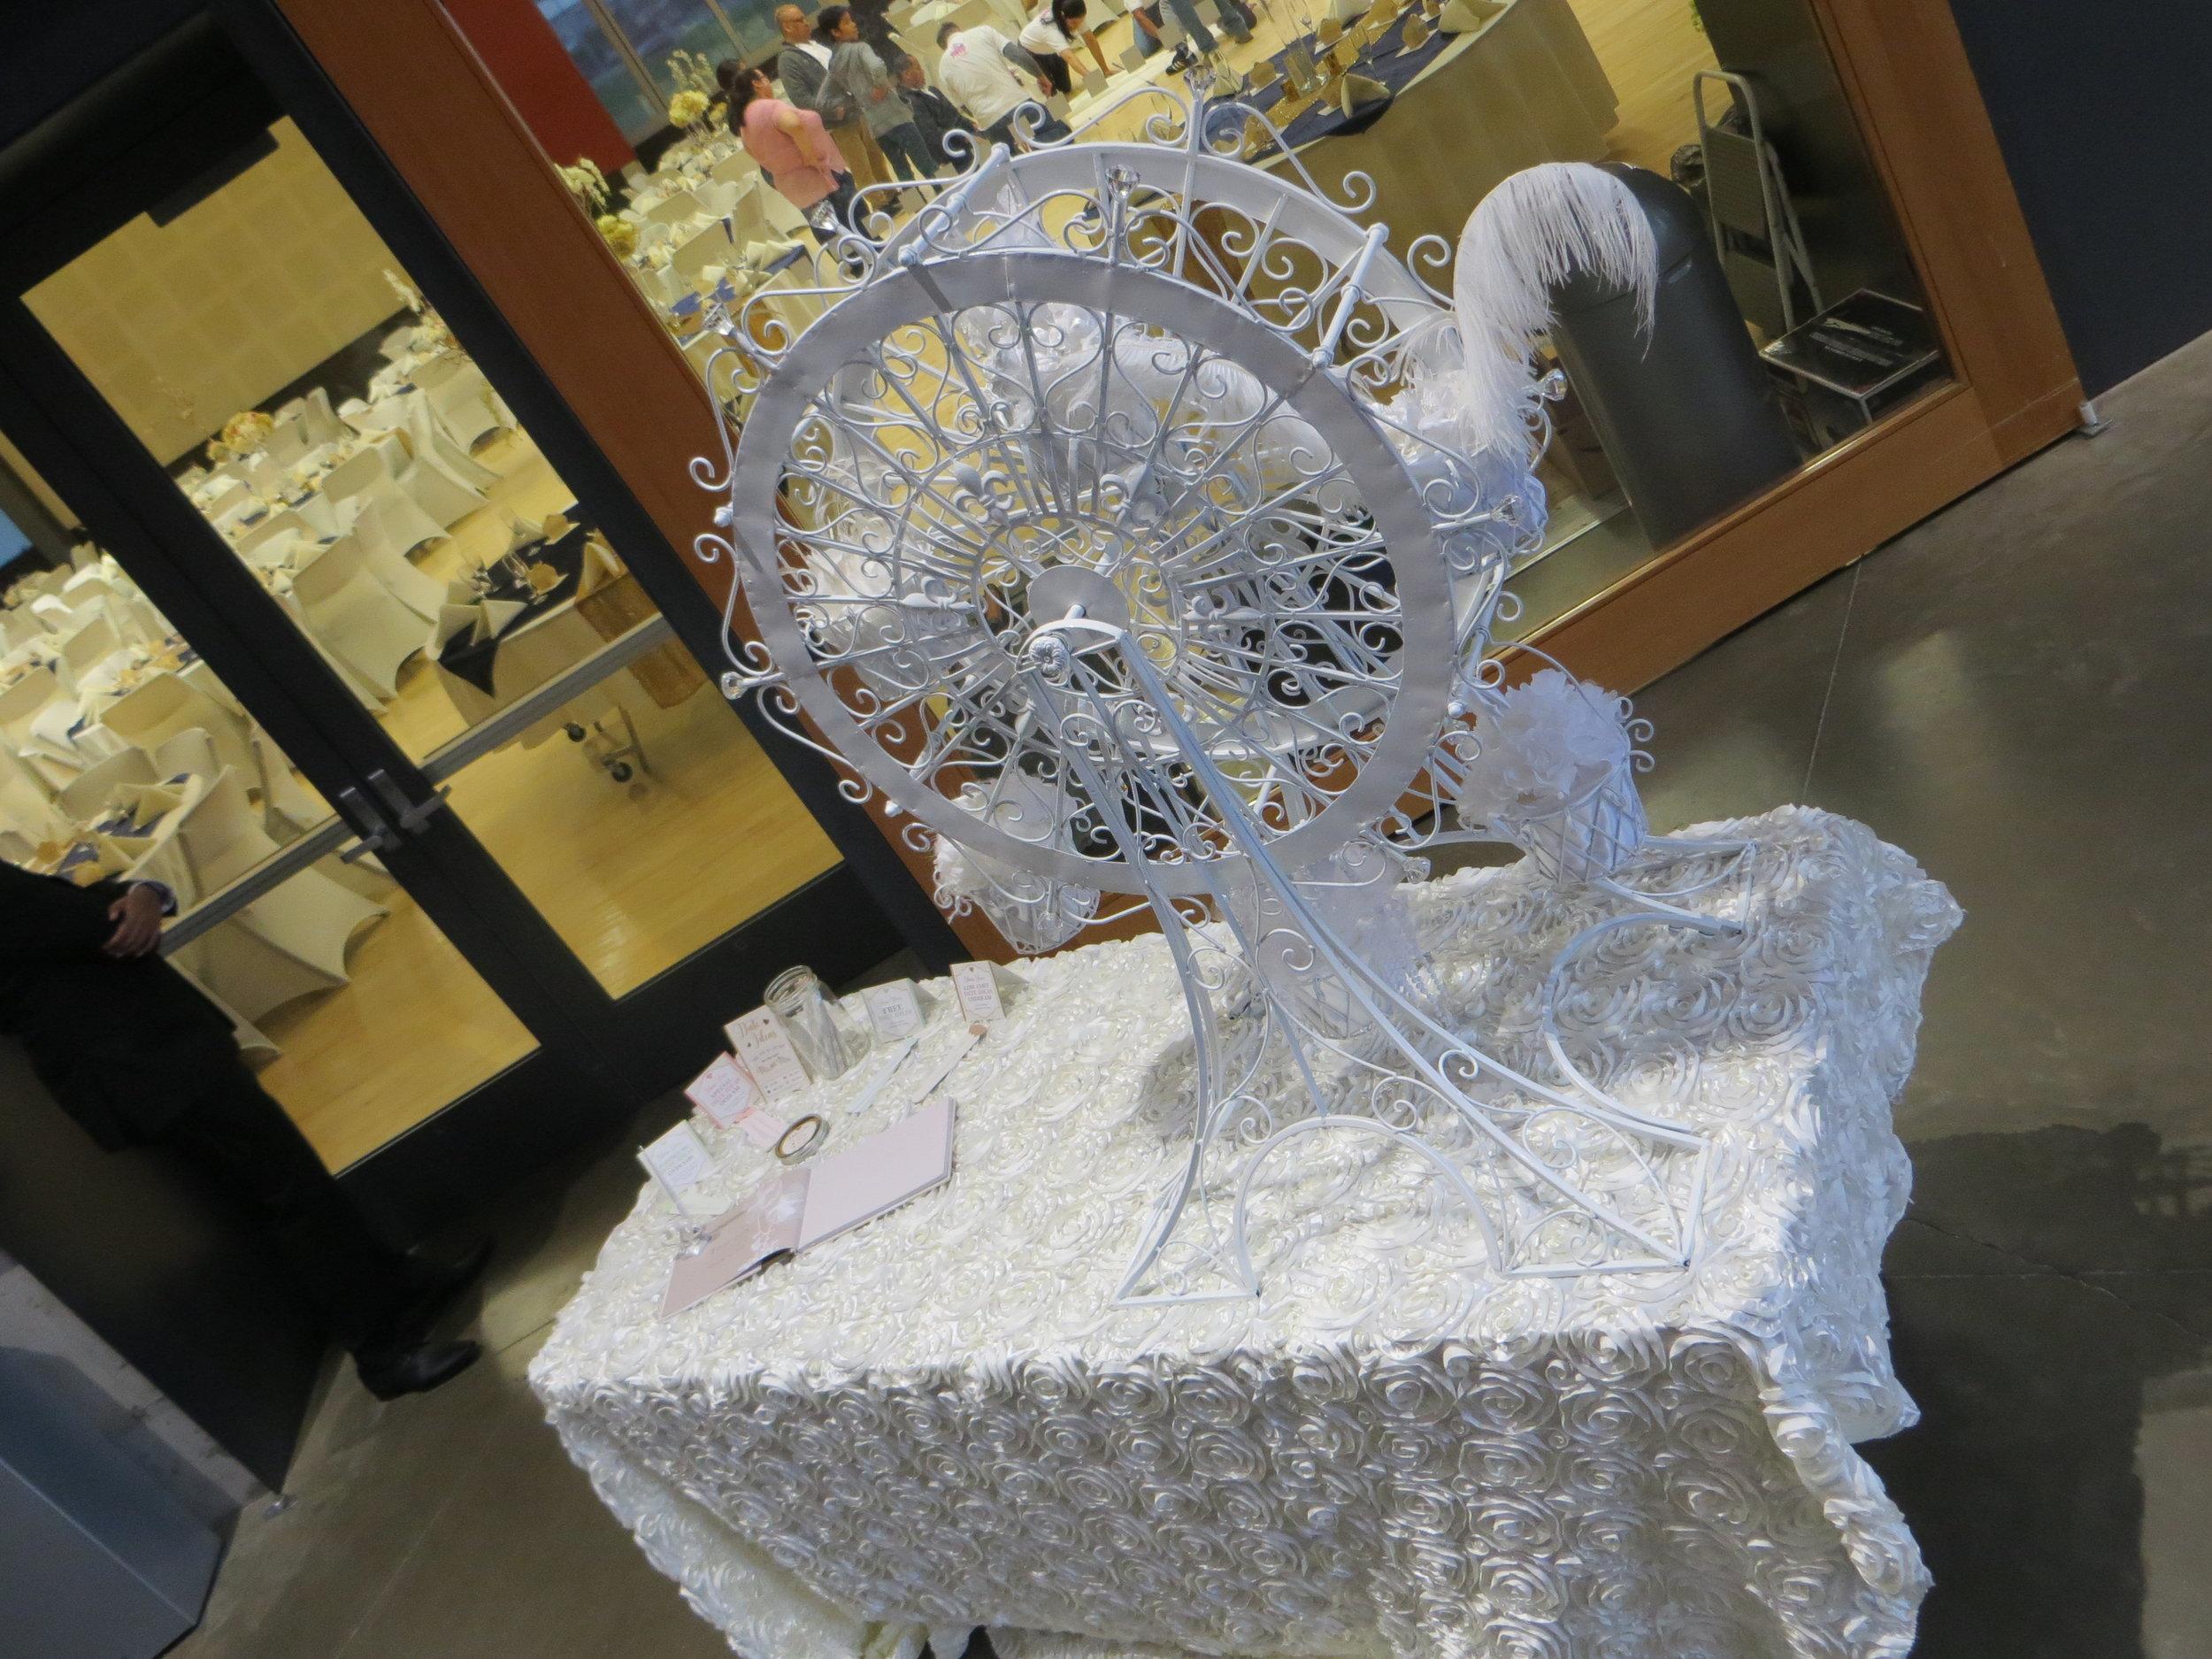 martin welcome table and ferris wheel.JPG